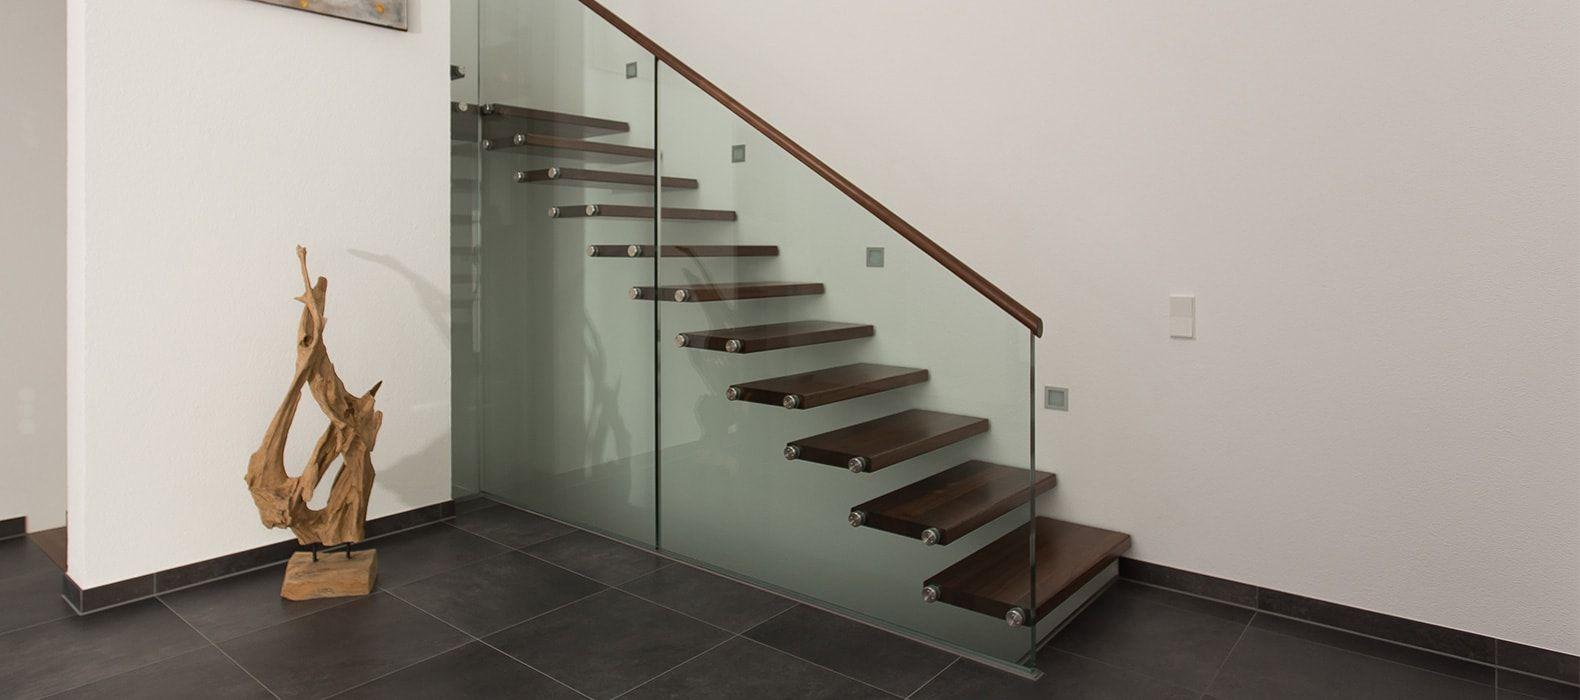 glastreppen von fhs treppen treppenhersteller f r fachkunden. Black Bedroom Furniture Sets. Home Design Ideas